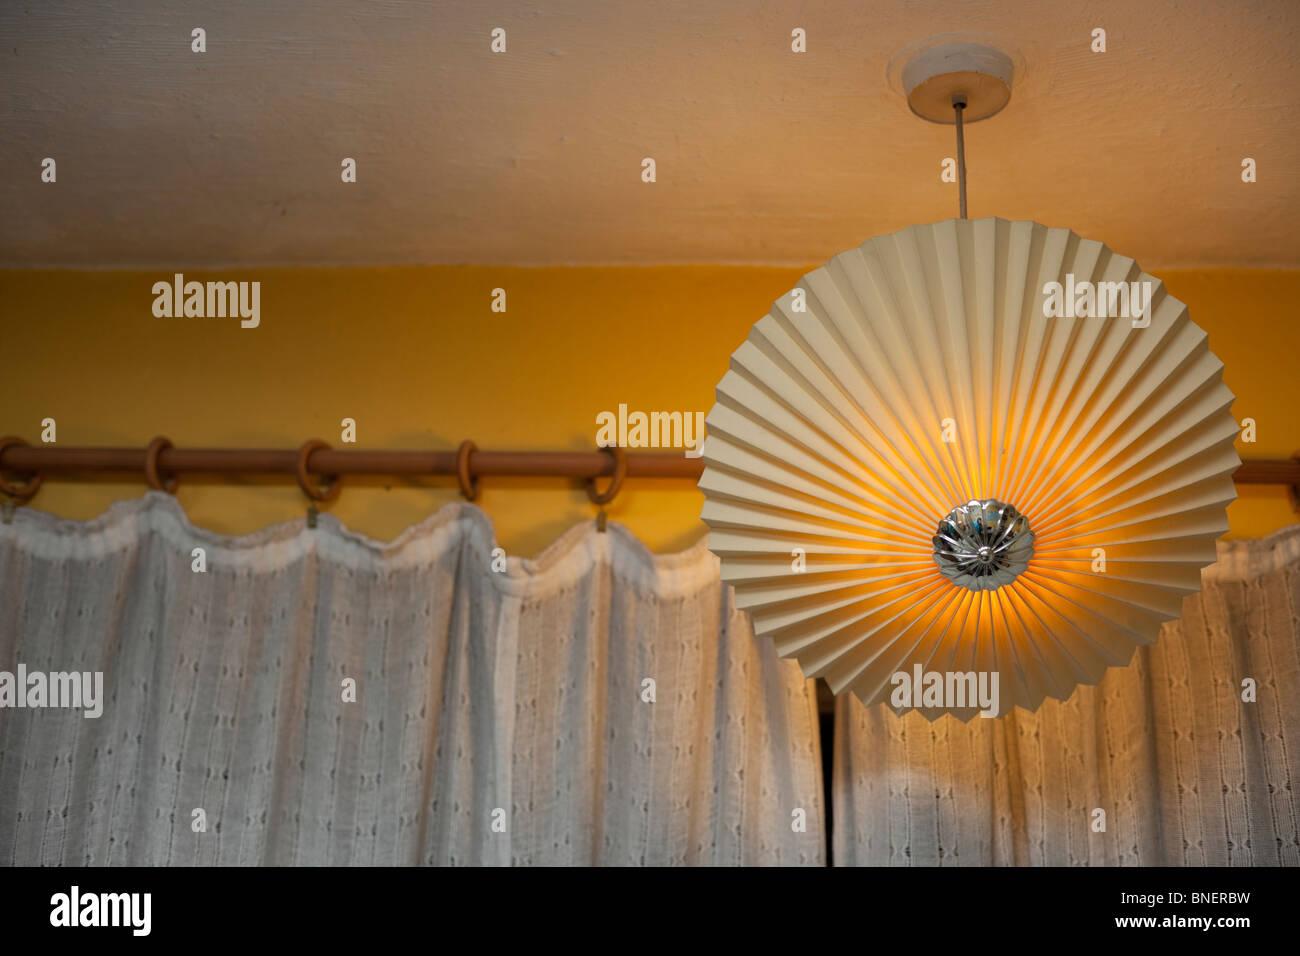 Circular lamp shade stock photos circular lamp shade stock images circular lamp shade hanging from ceiling uk stock image aloadofball Gallery